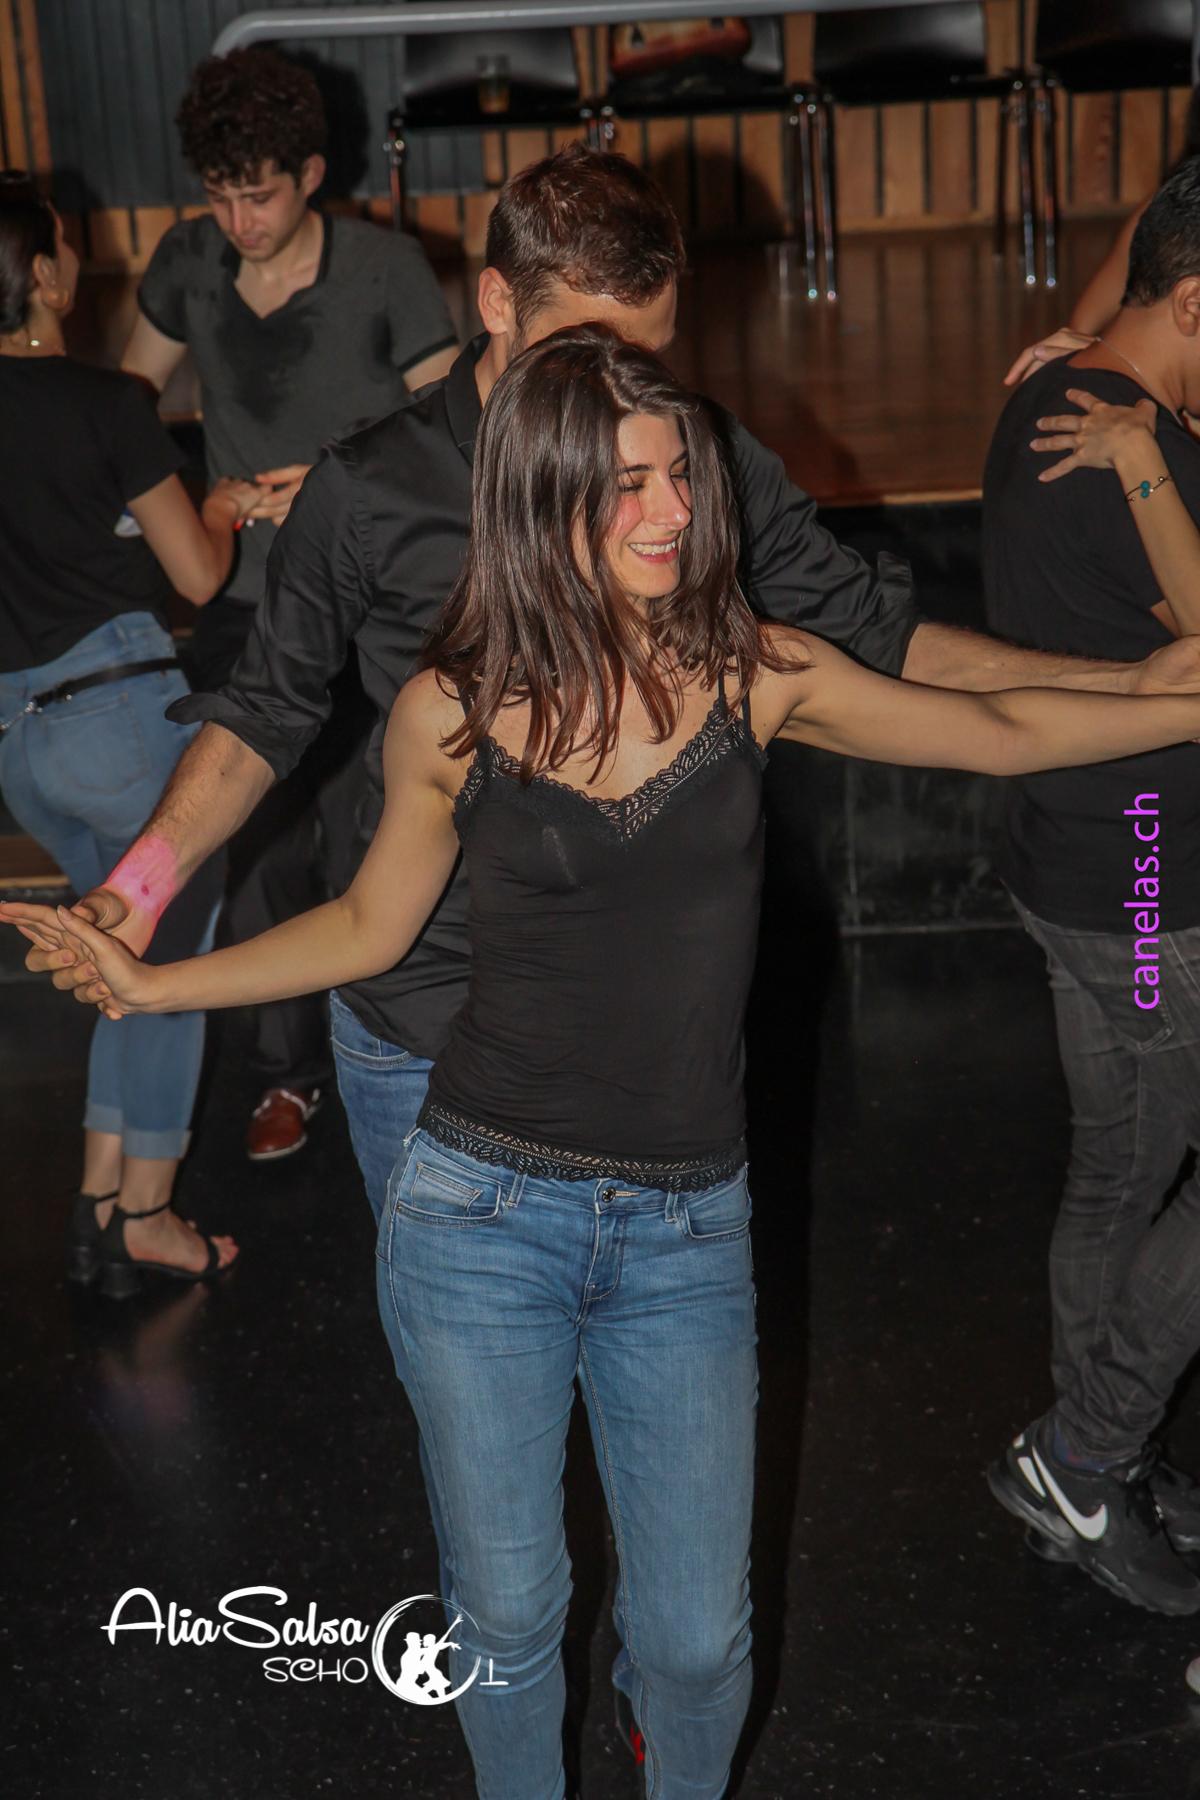 AliaSalsa ecole de danse lausanne soiree bachata salsa cubaineAlia Salsa Soireé Salsa - Bachata-50